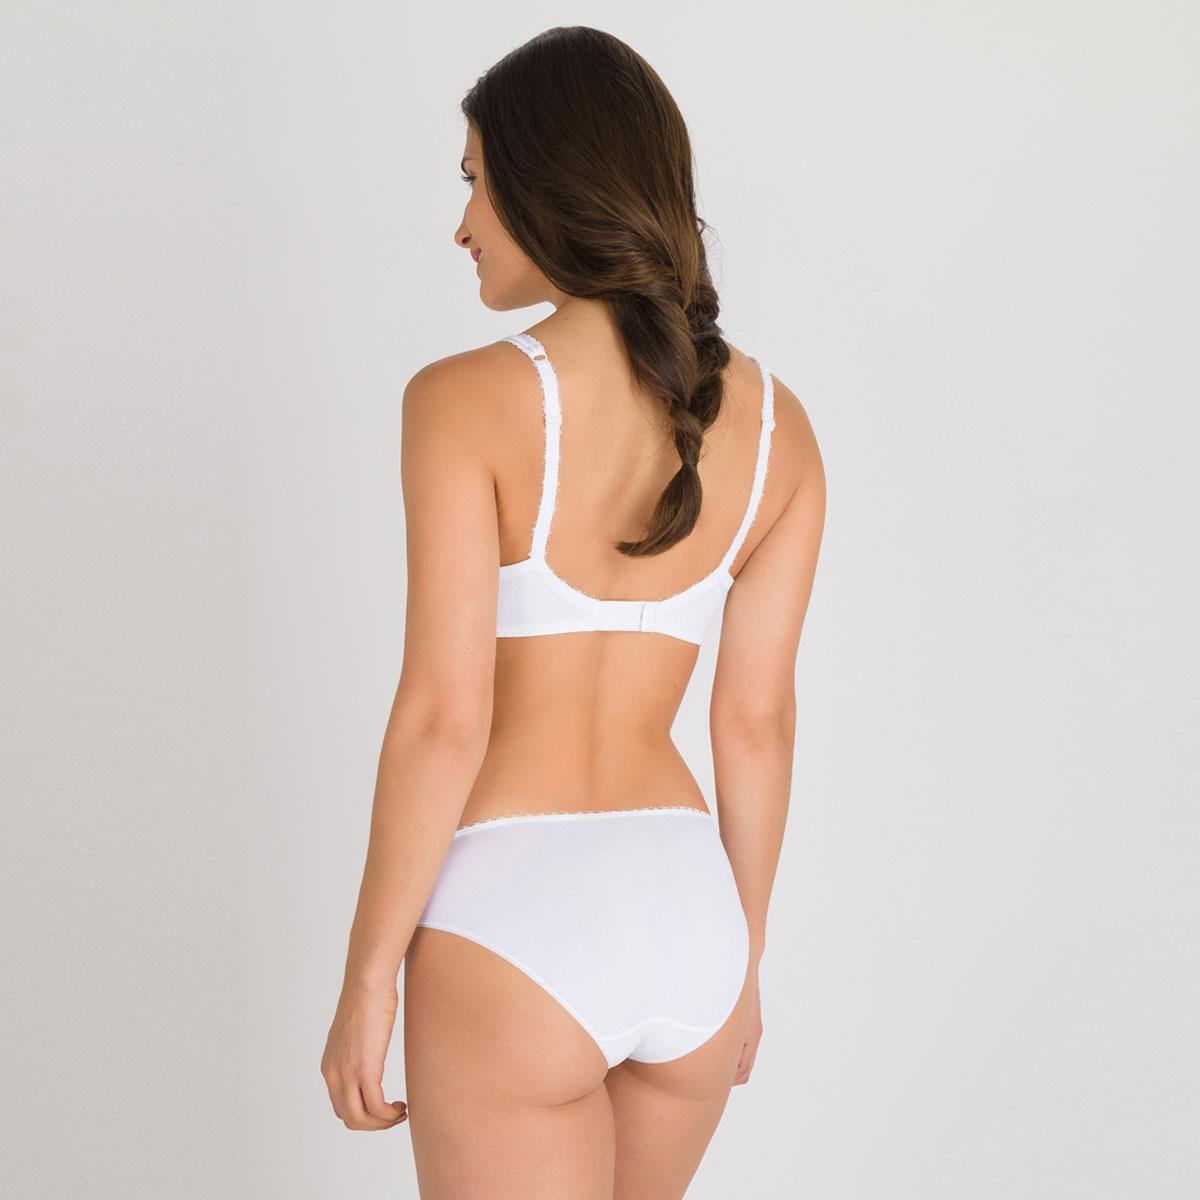 Non-wired spacer Bra in White – Flower Elegance-PLAYTEX